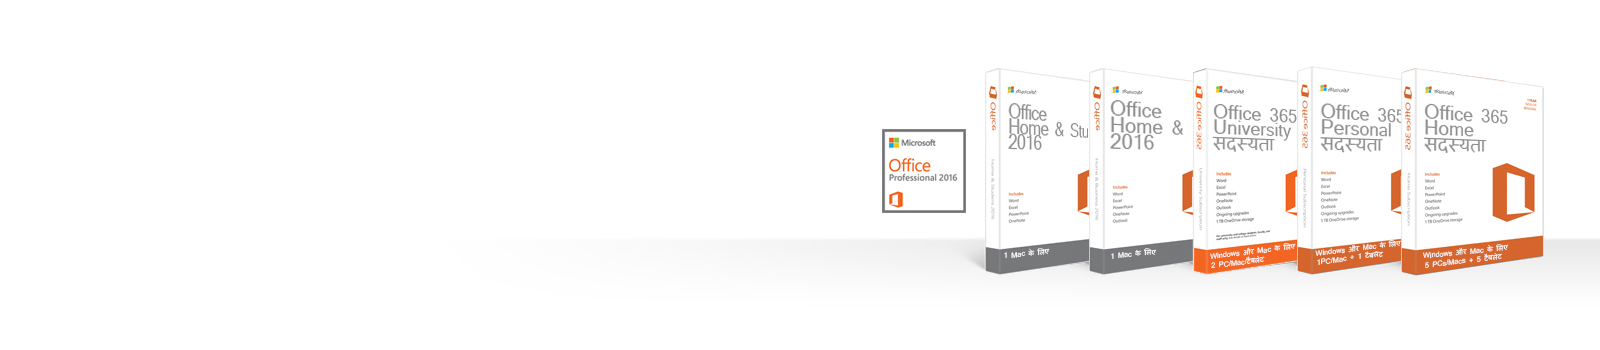 Office उत्पाद प्रबंधित करना, डाउनलोड करना, बैकअप लेना या पुनर्स्थापित करना